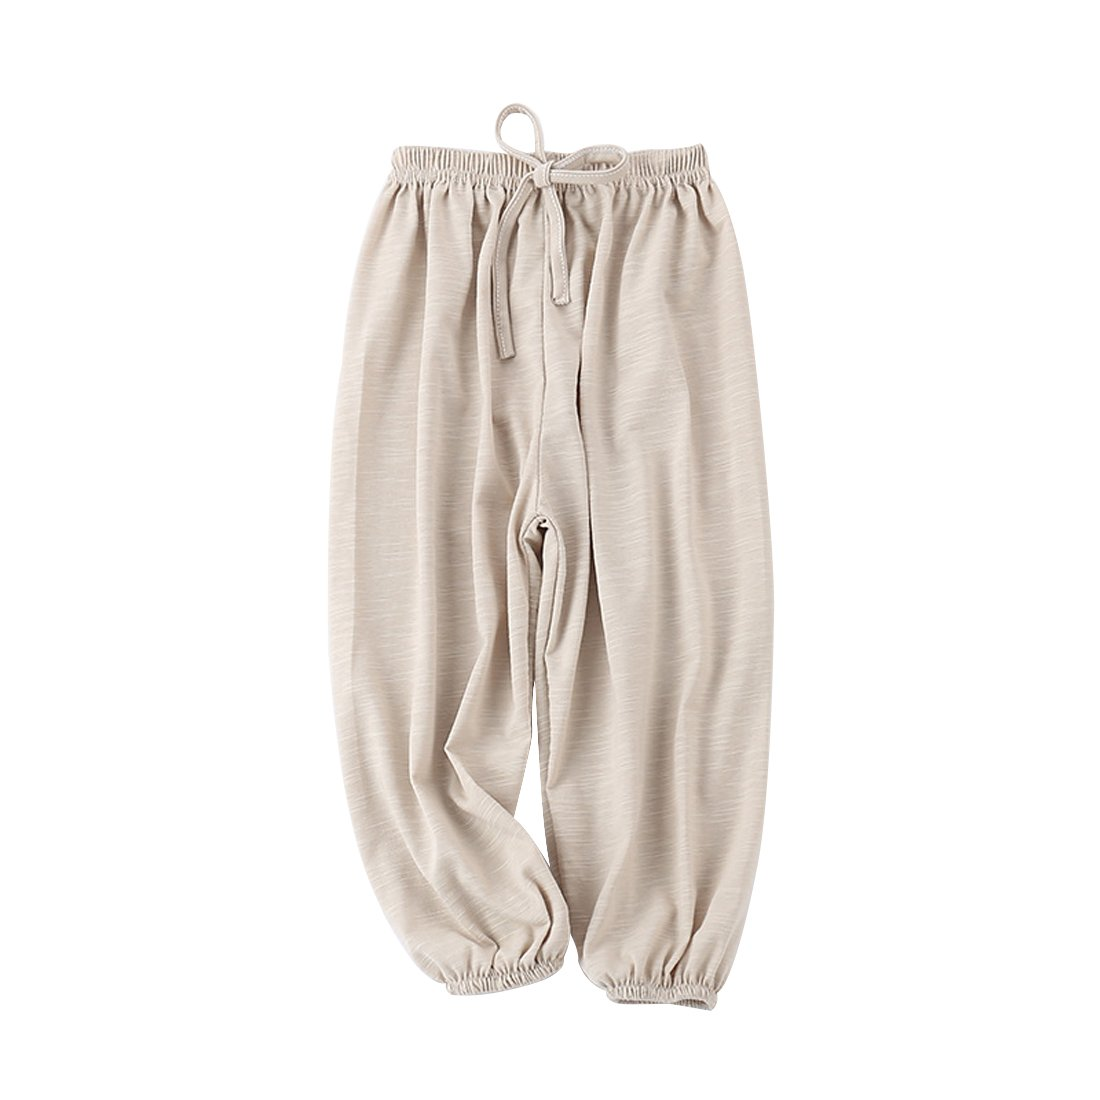 PAUBOLI Baby Long Bloomers Soft Slub Cotton Harem Pants for Boys Girls 12M-7T (6-7 Years, Beige)